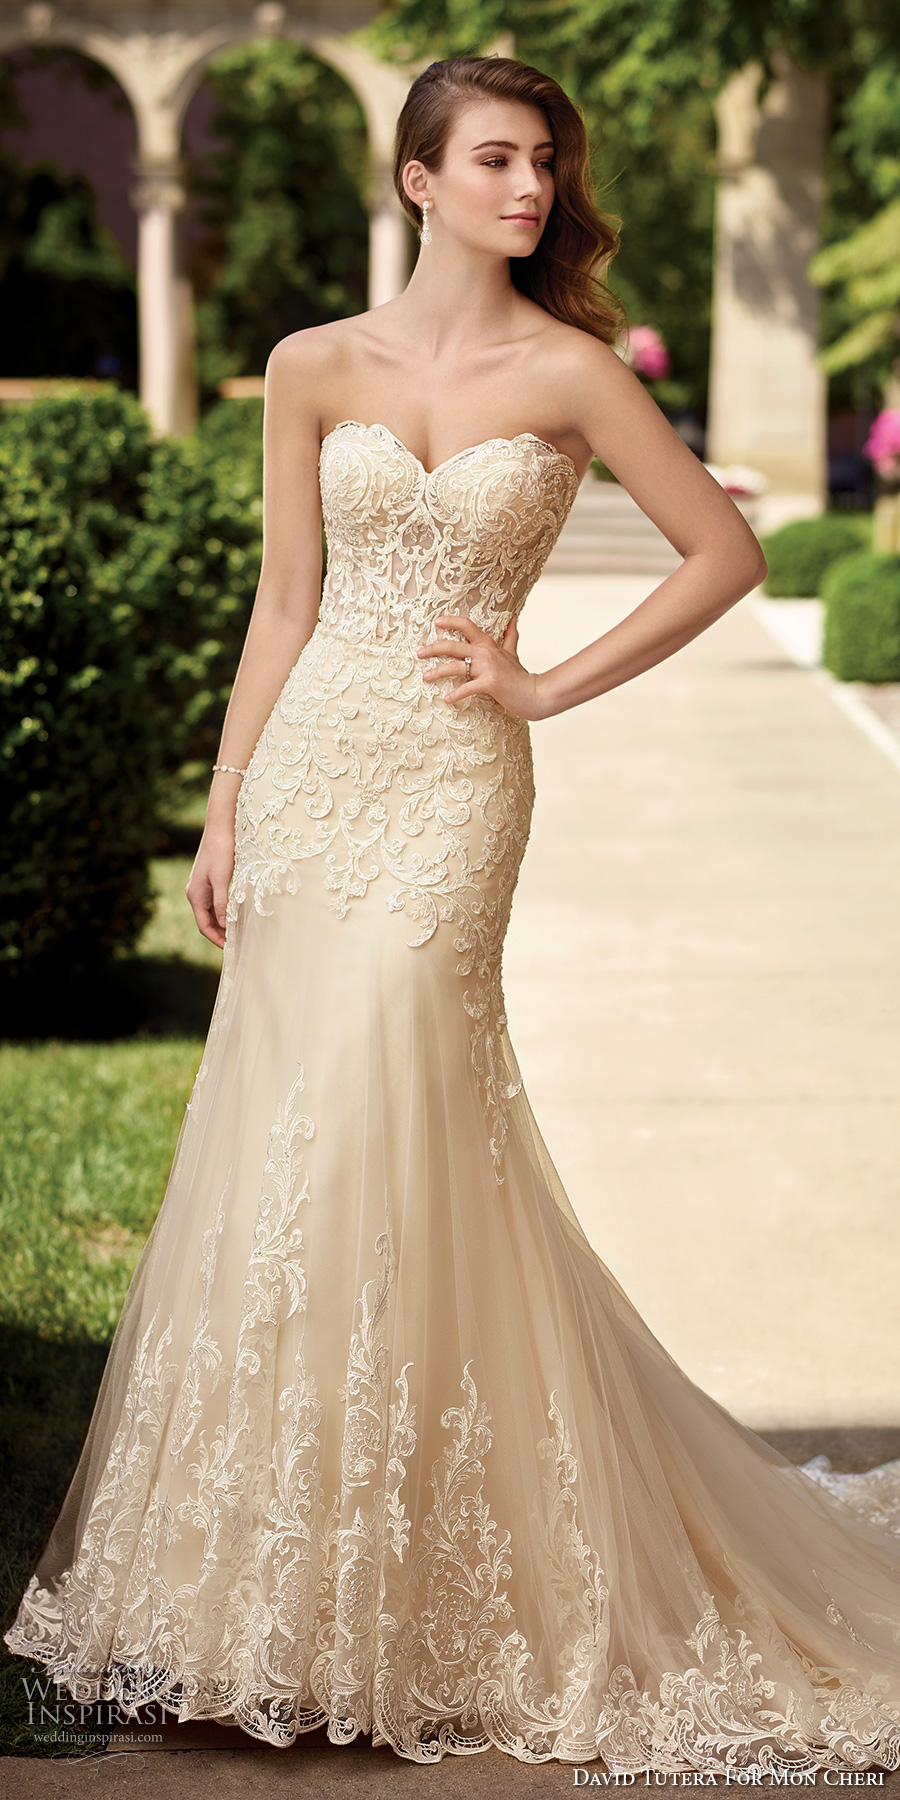 c7f771f7355 david tutera mc spring 2017 bridal strapless sweetheart neckline heavily  embellished bodice elegant ivory color sheath